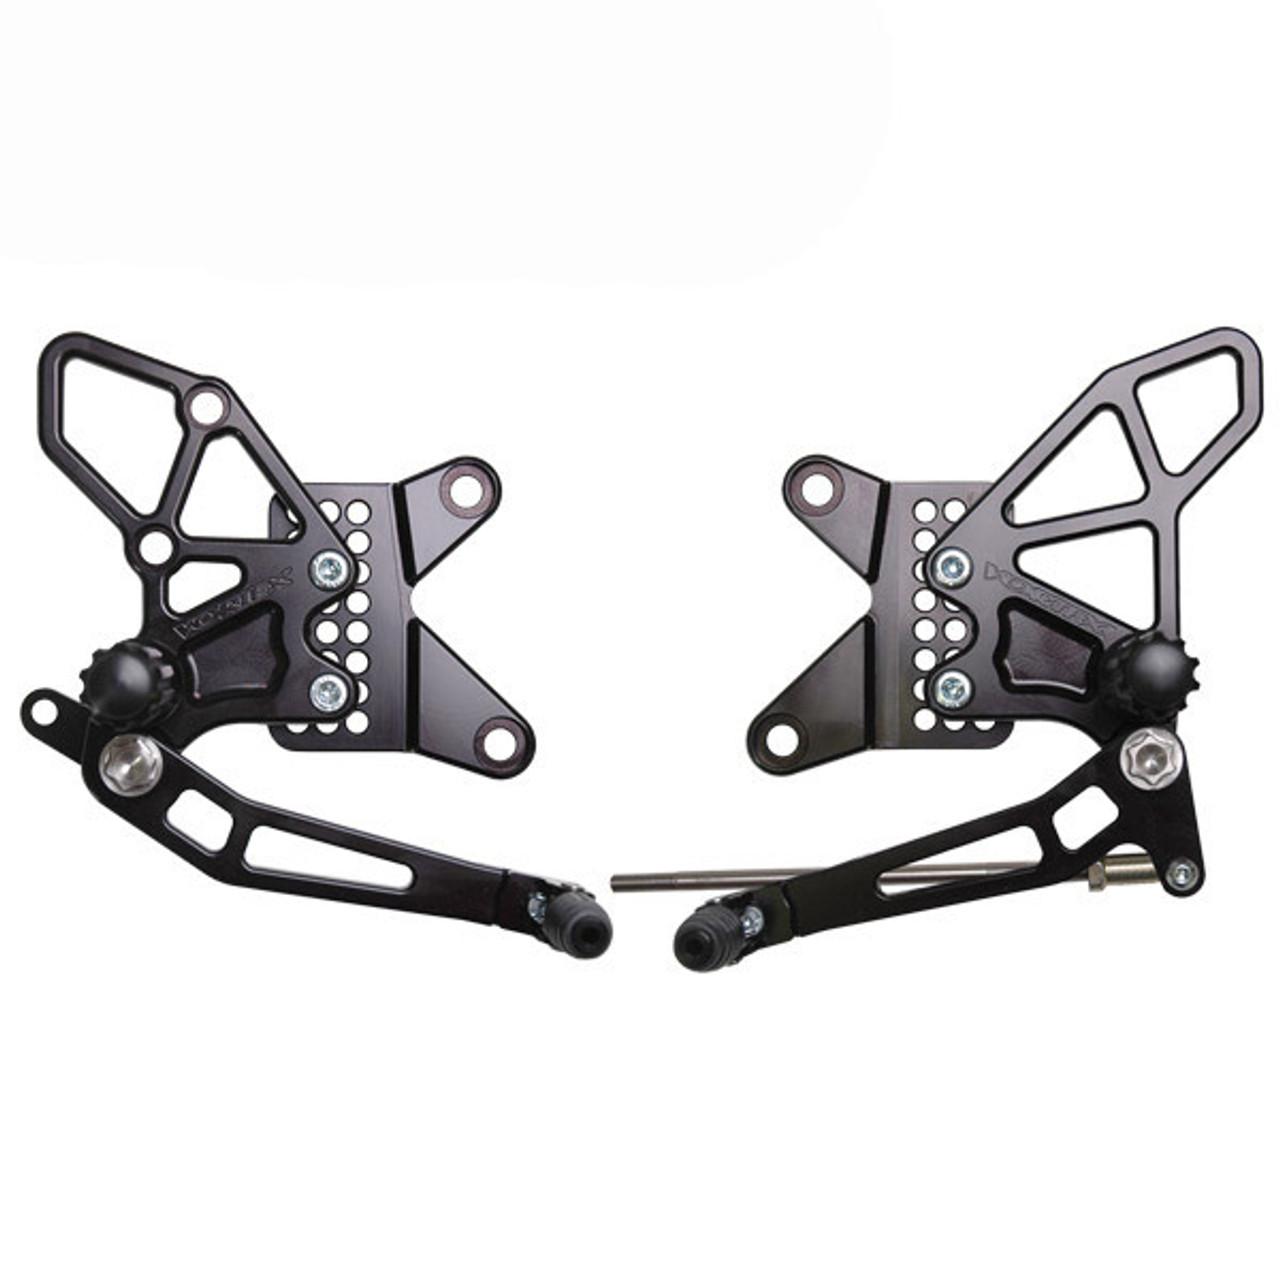 Vortex Kawasaki ZX6R 2013-2019 Adjustable Rearsets V2